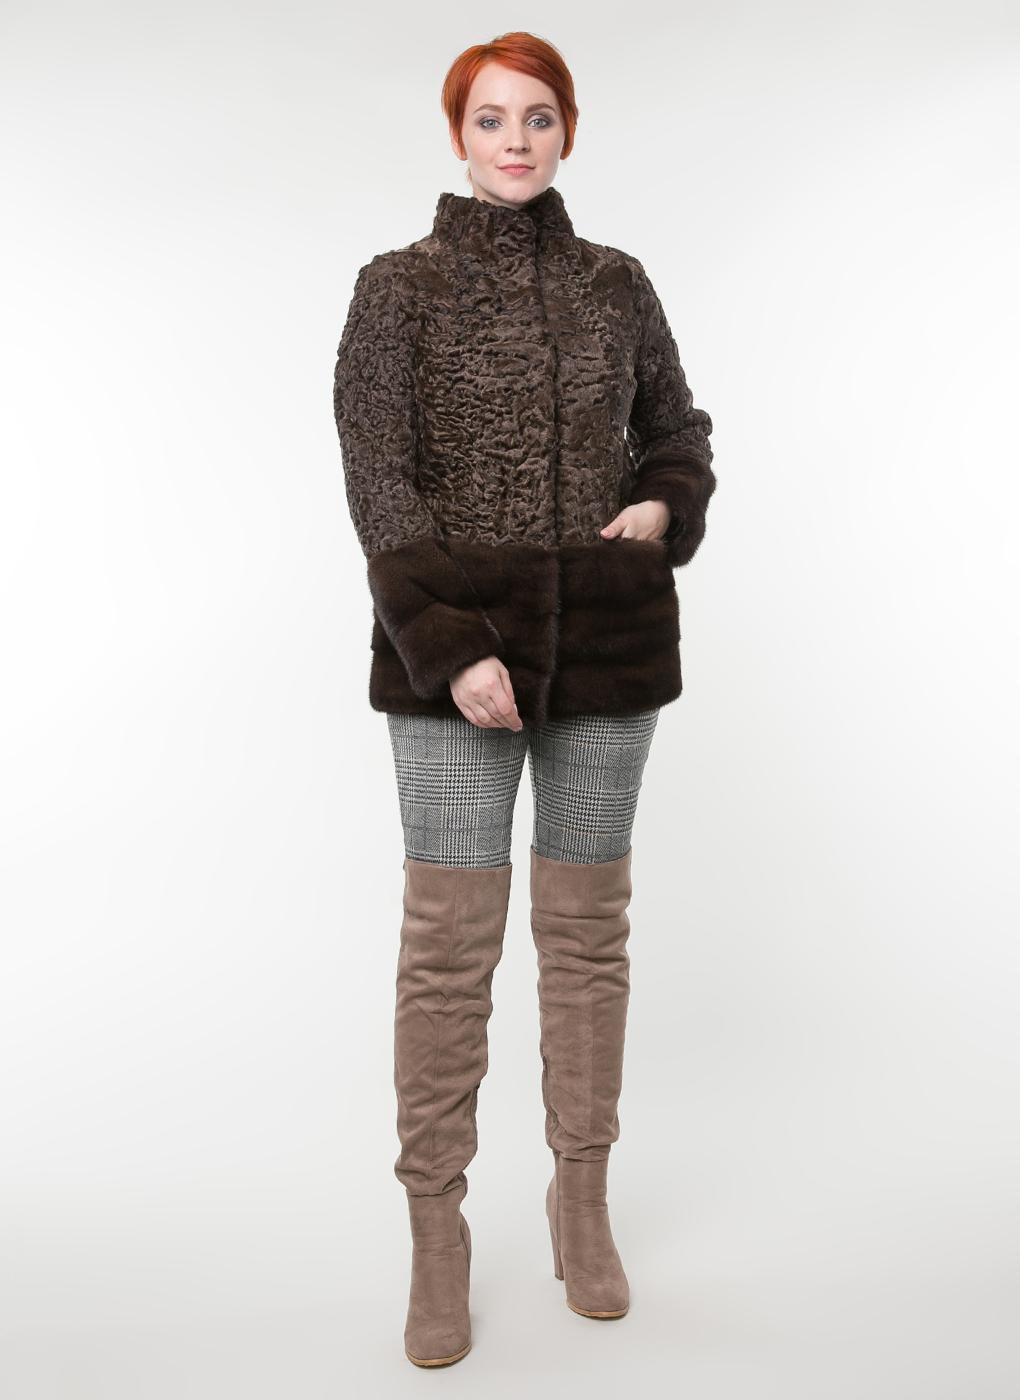 Куртка из каракуля Хелен 01, Элина